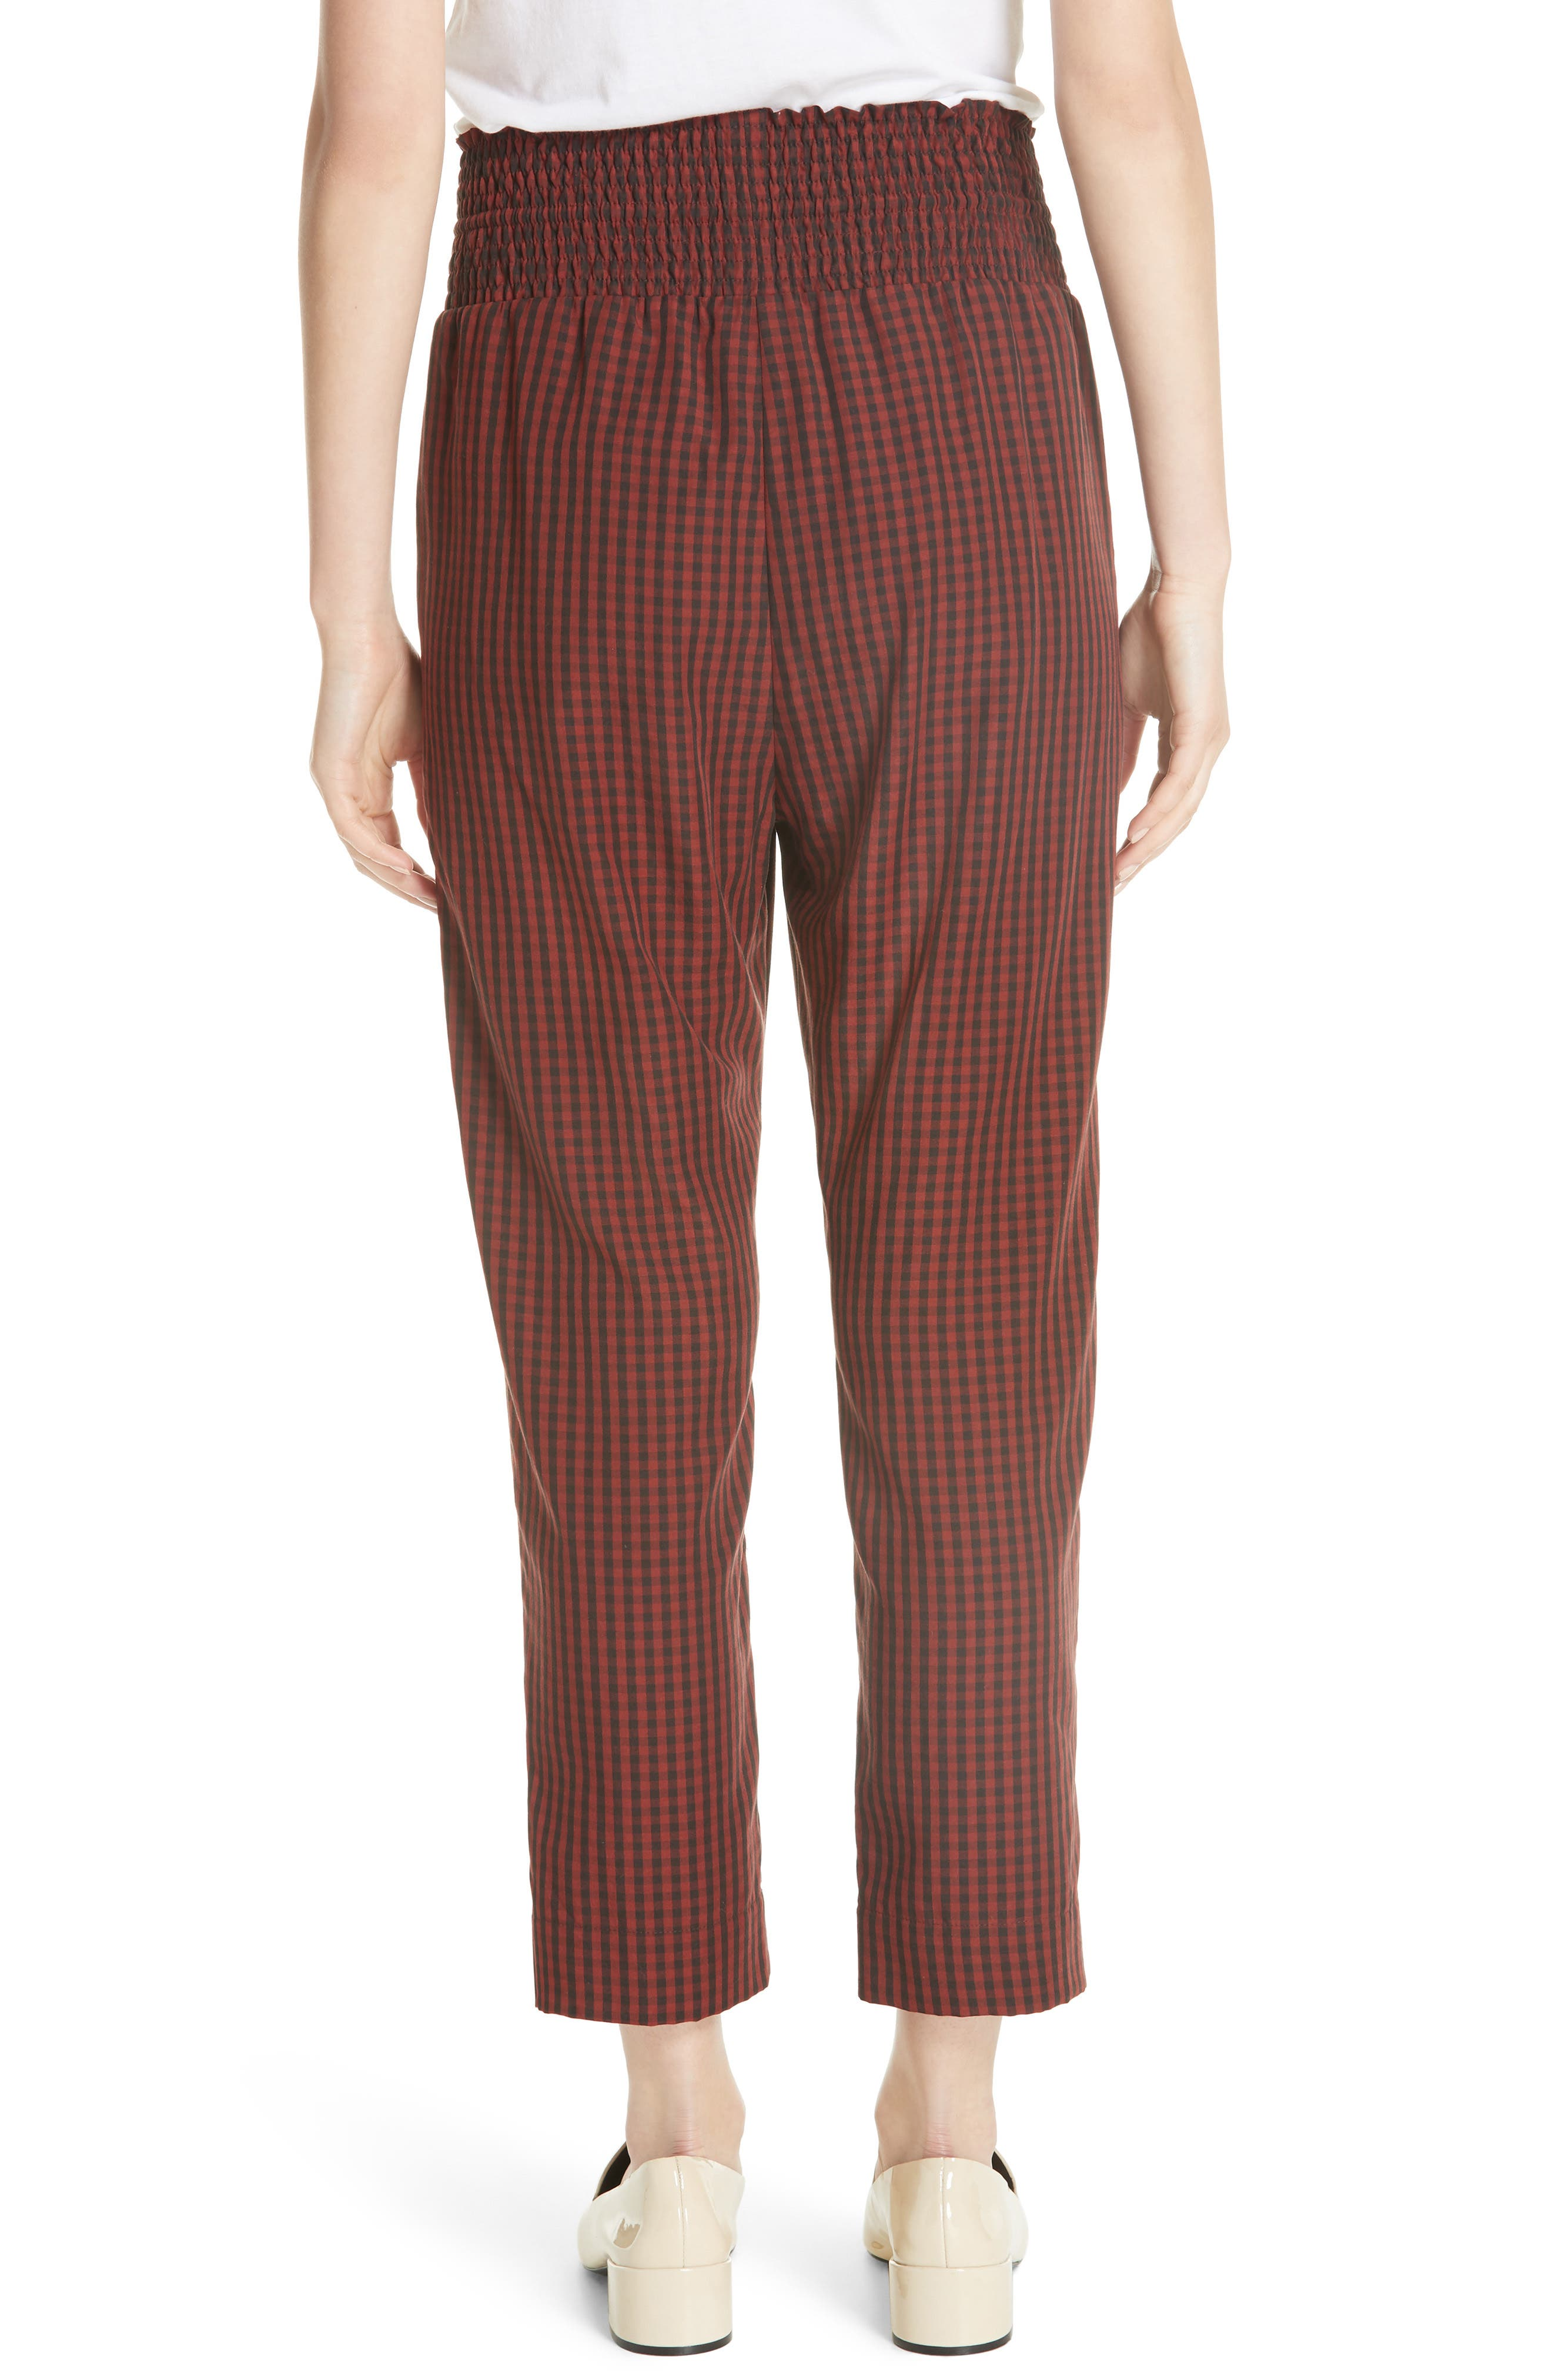 Harlem Gingham Crop Pants,                             Alternate thumbnail 2, color,                             RED CHECK